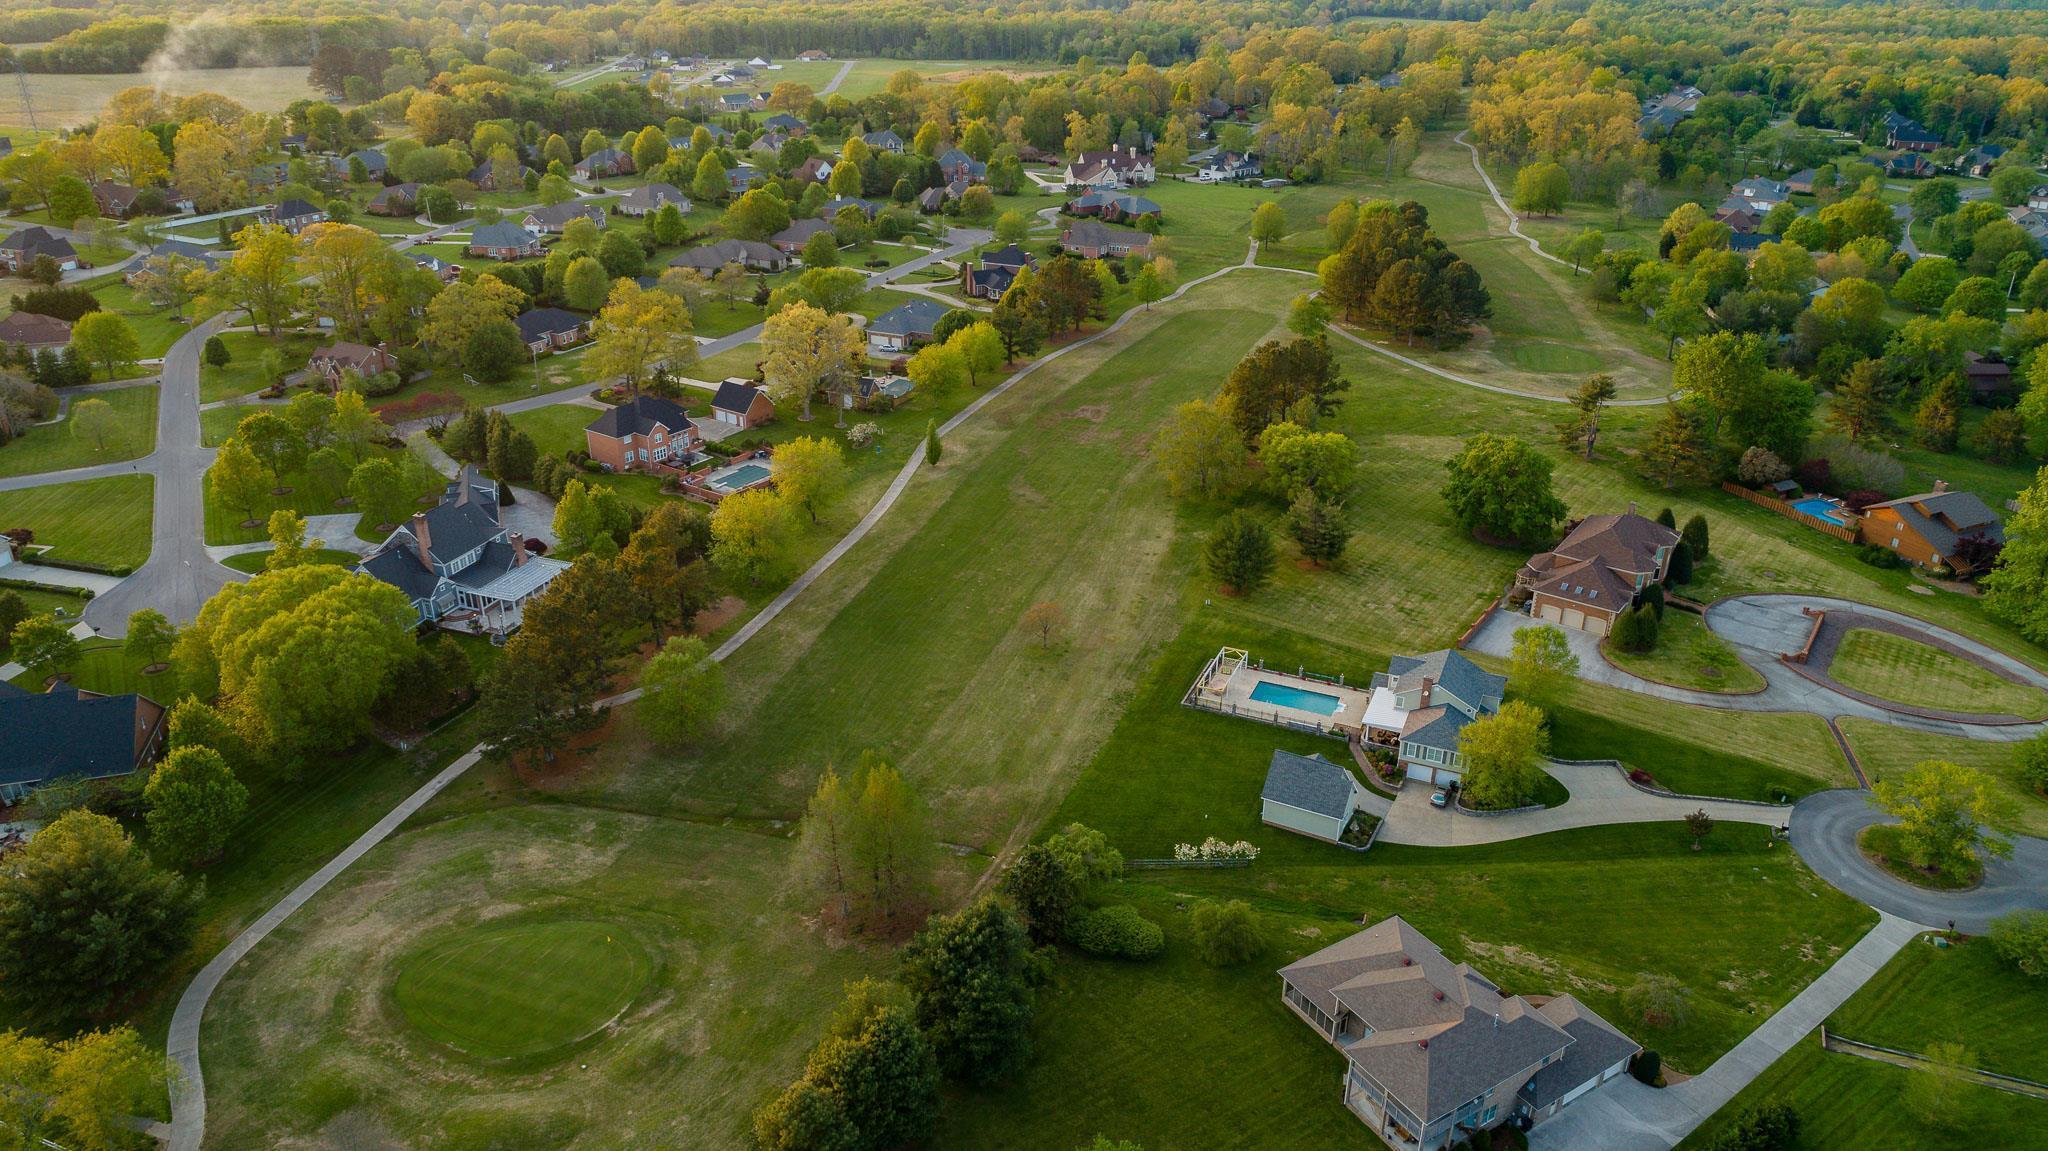 1808 OVOCA RD, Tullahoma, TN 37388 - Tullahoma, TN real estate listing